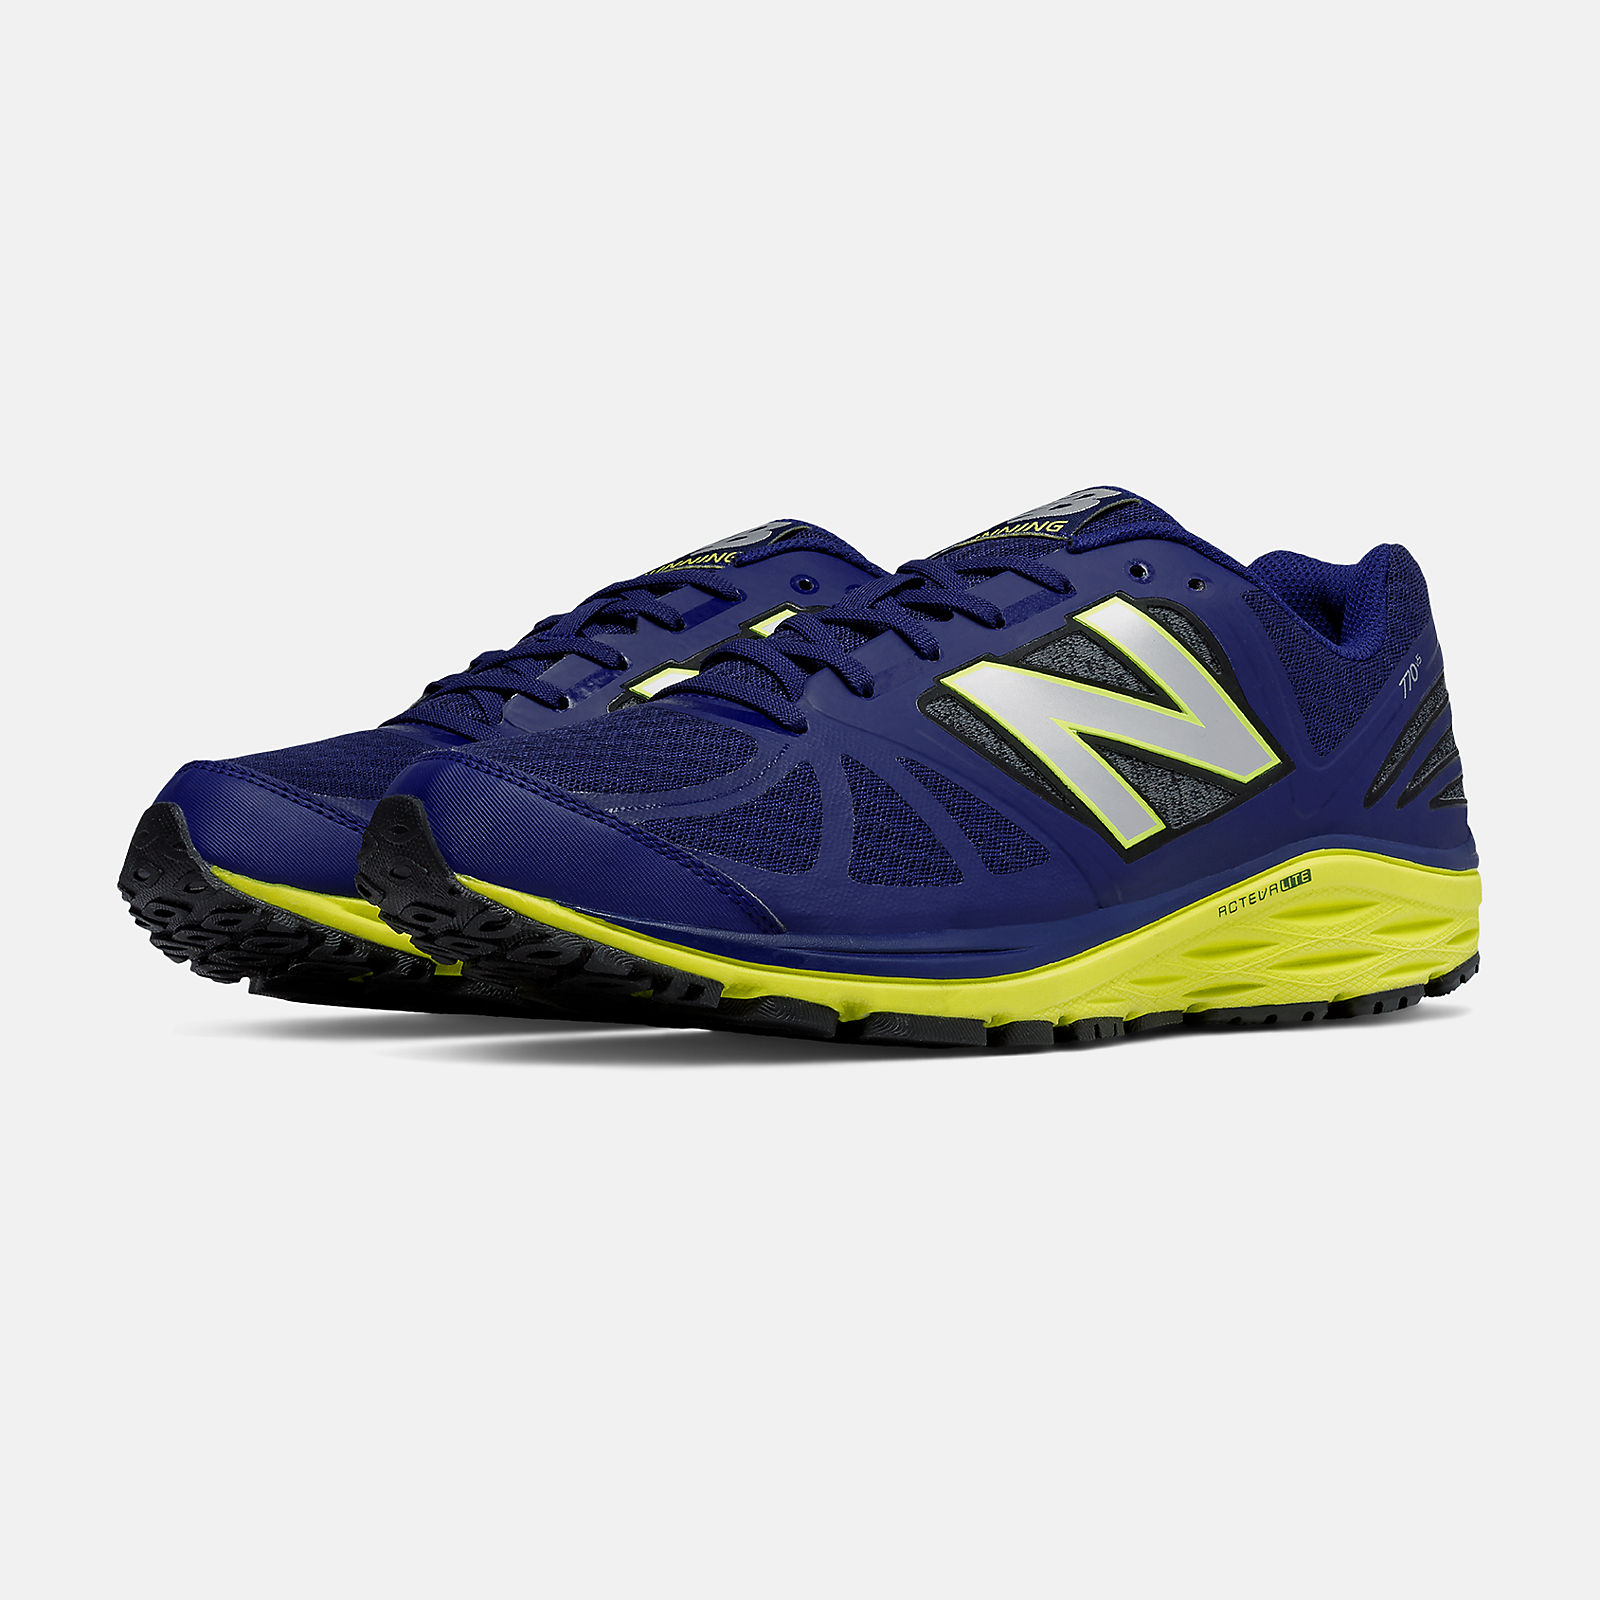 New Balance 770v5 - New Balance